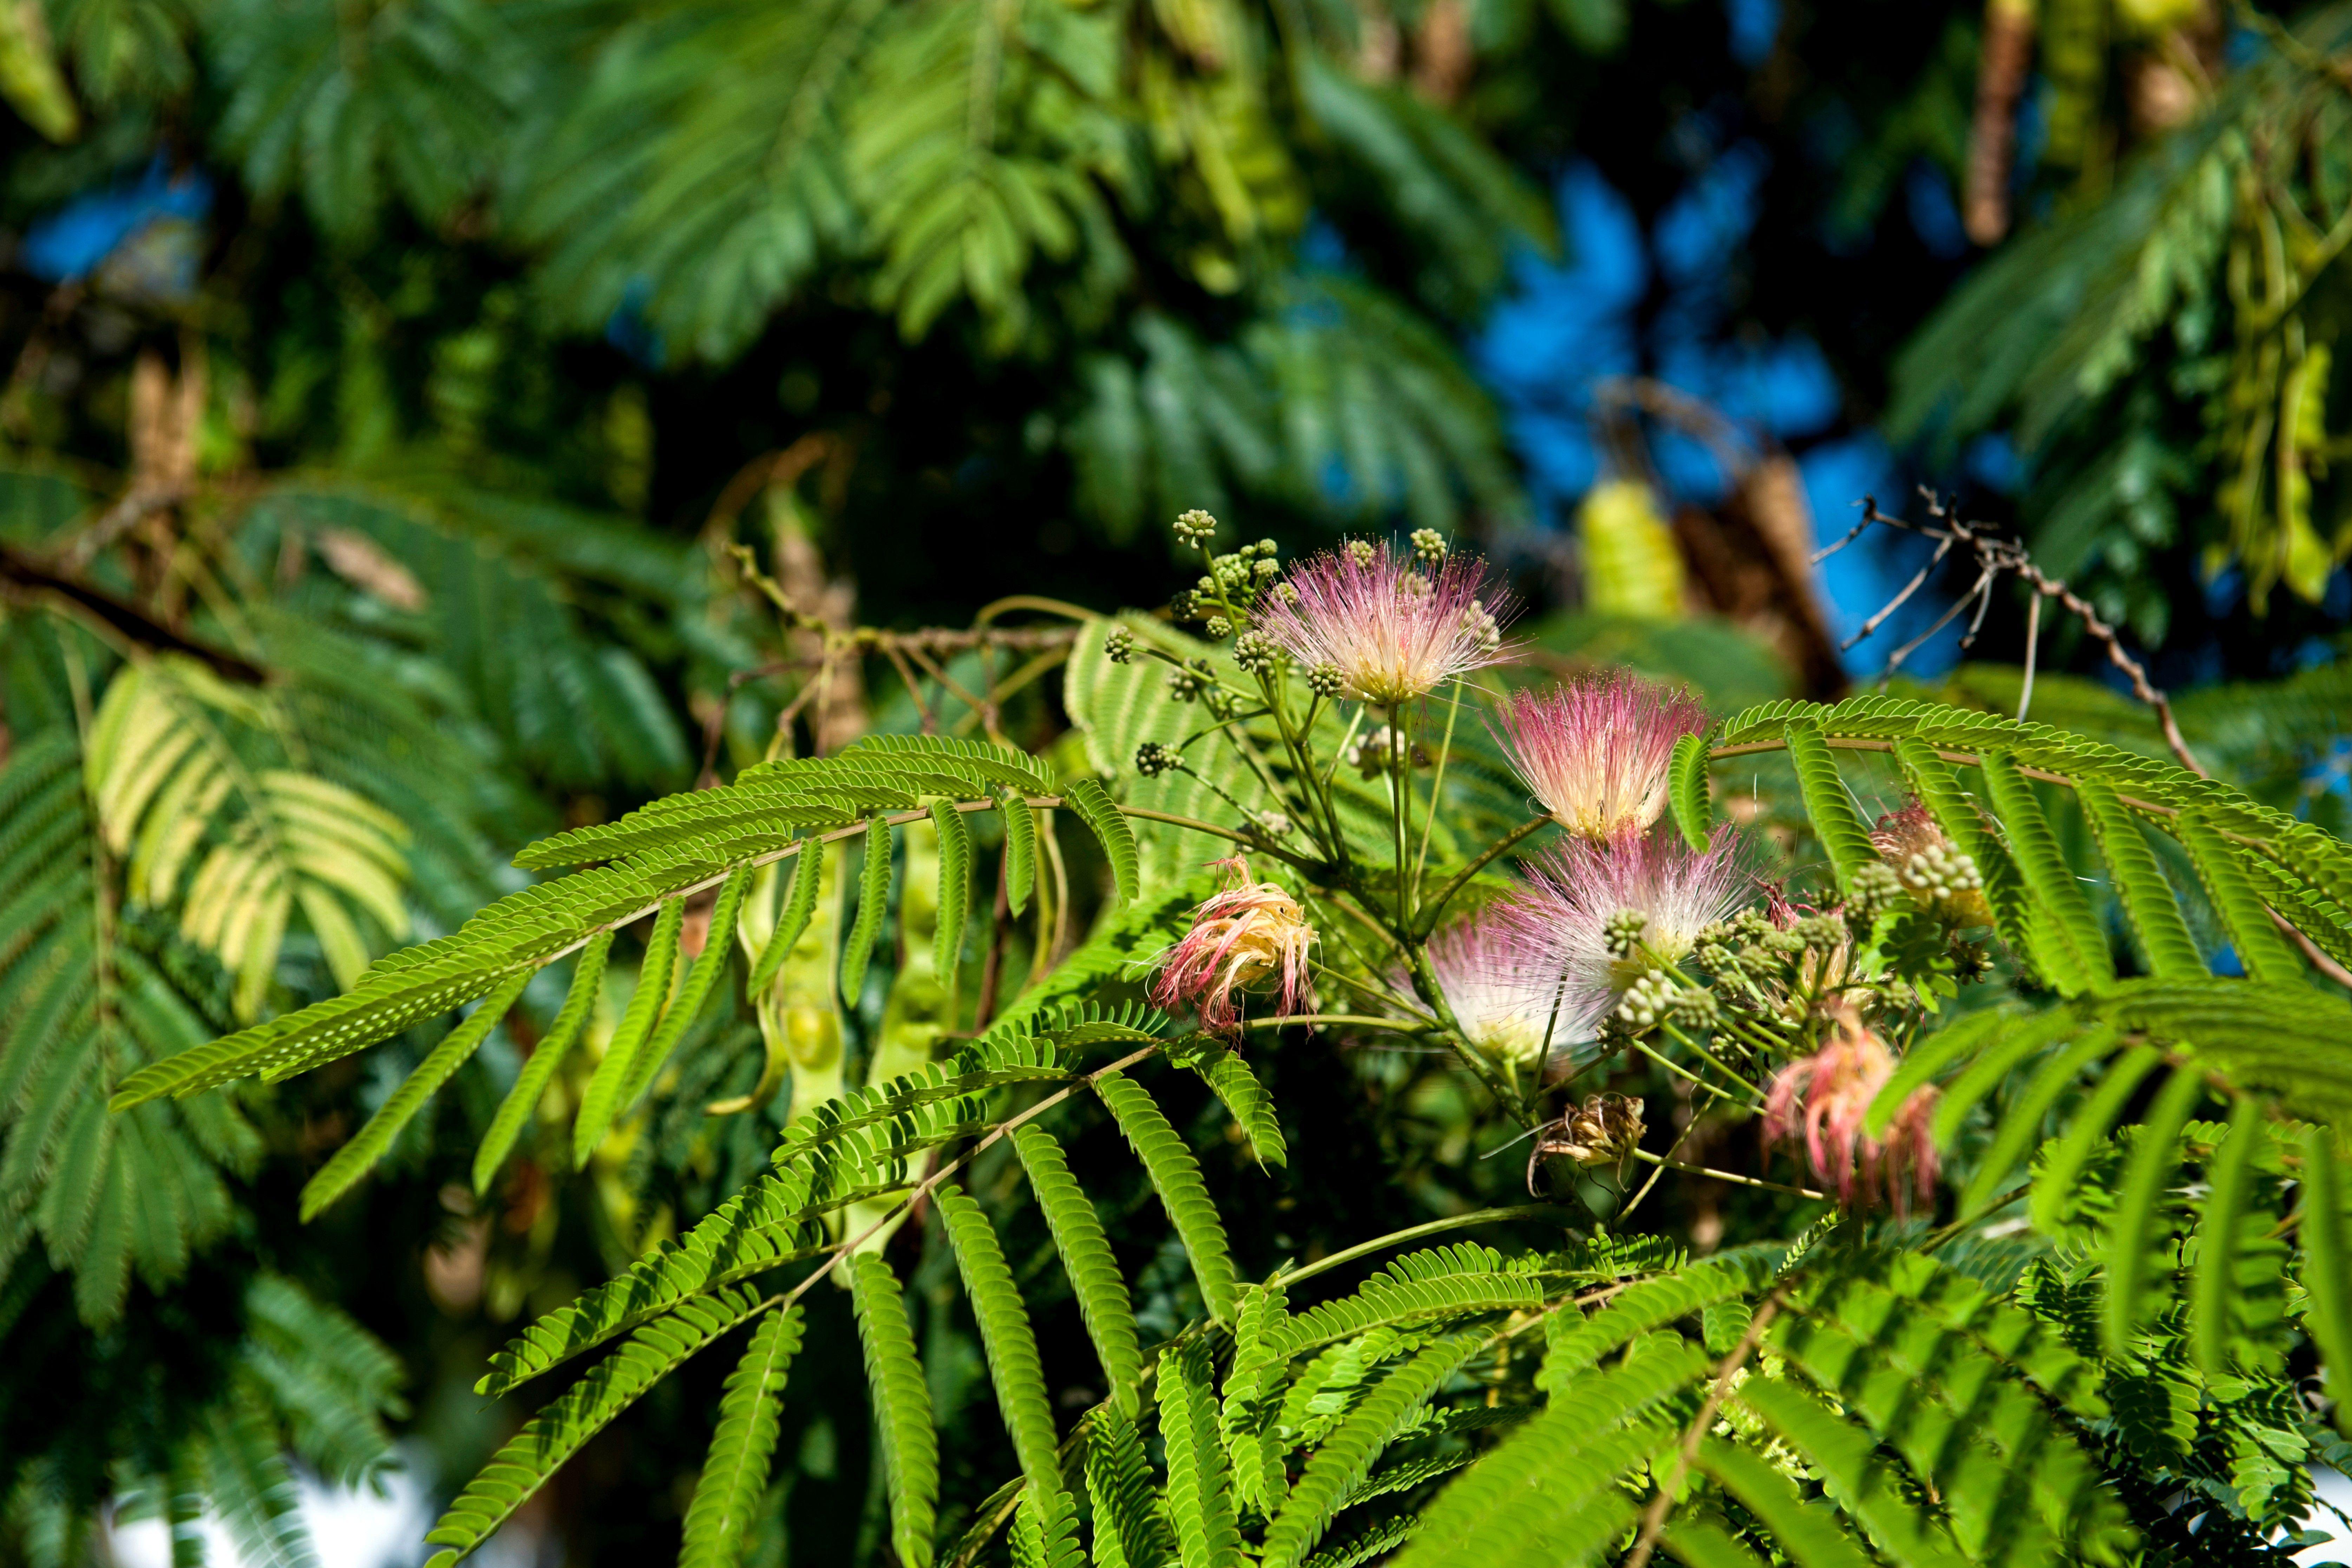 The distinctive, fluffy, pinkish purple flowers of a silk tree against the fern-like foliage